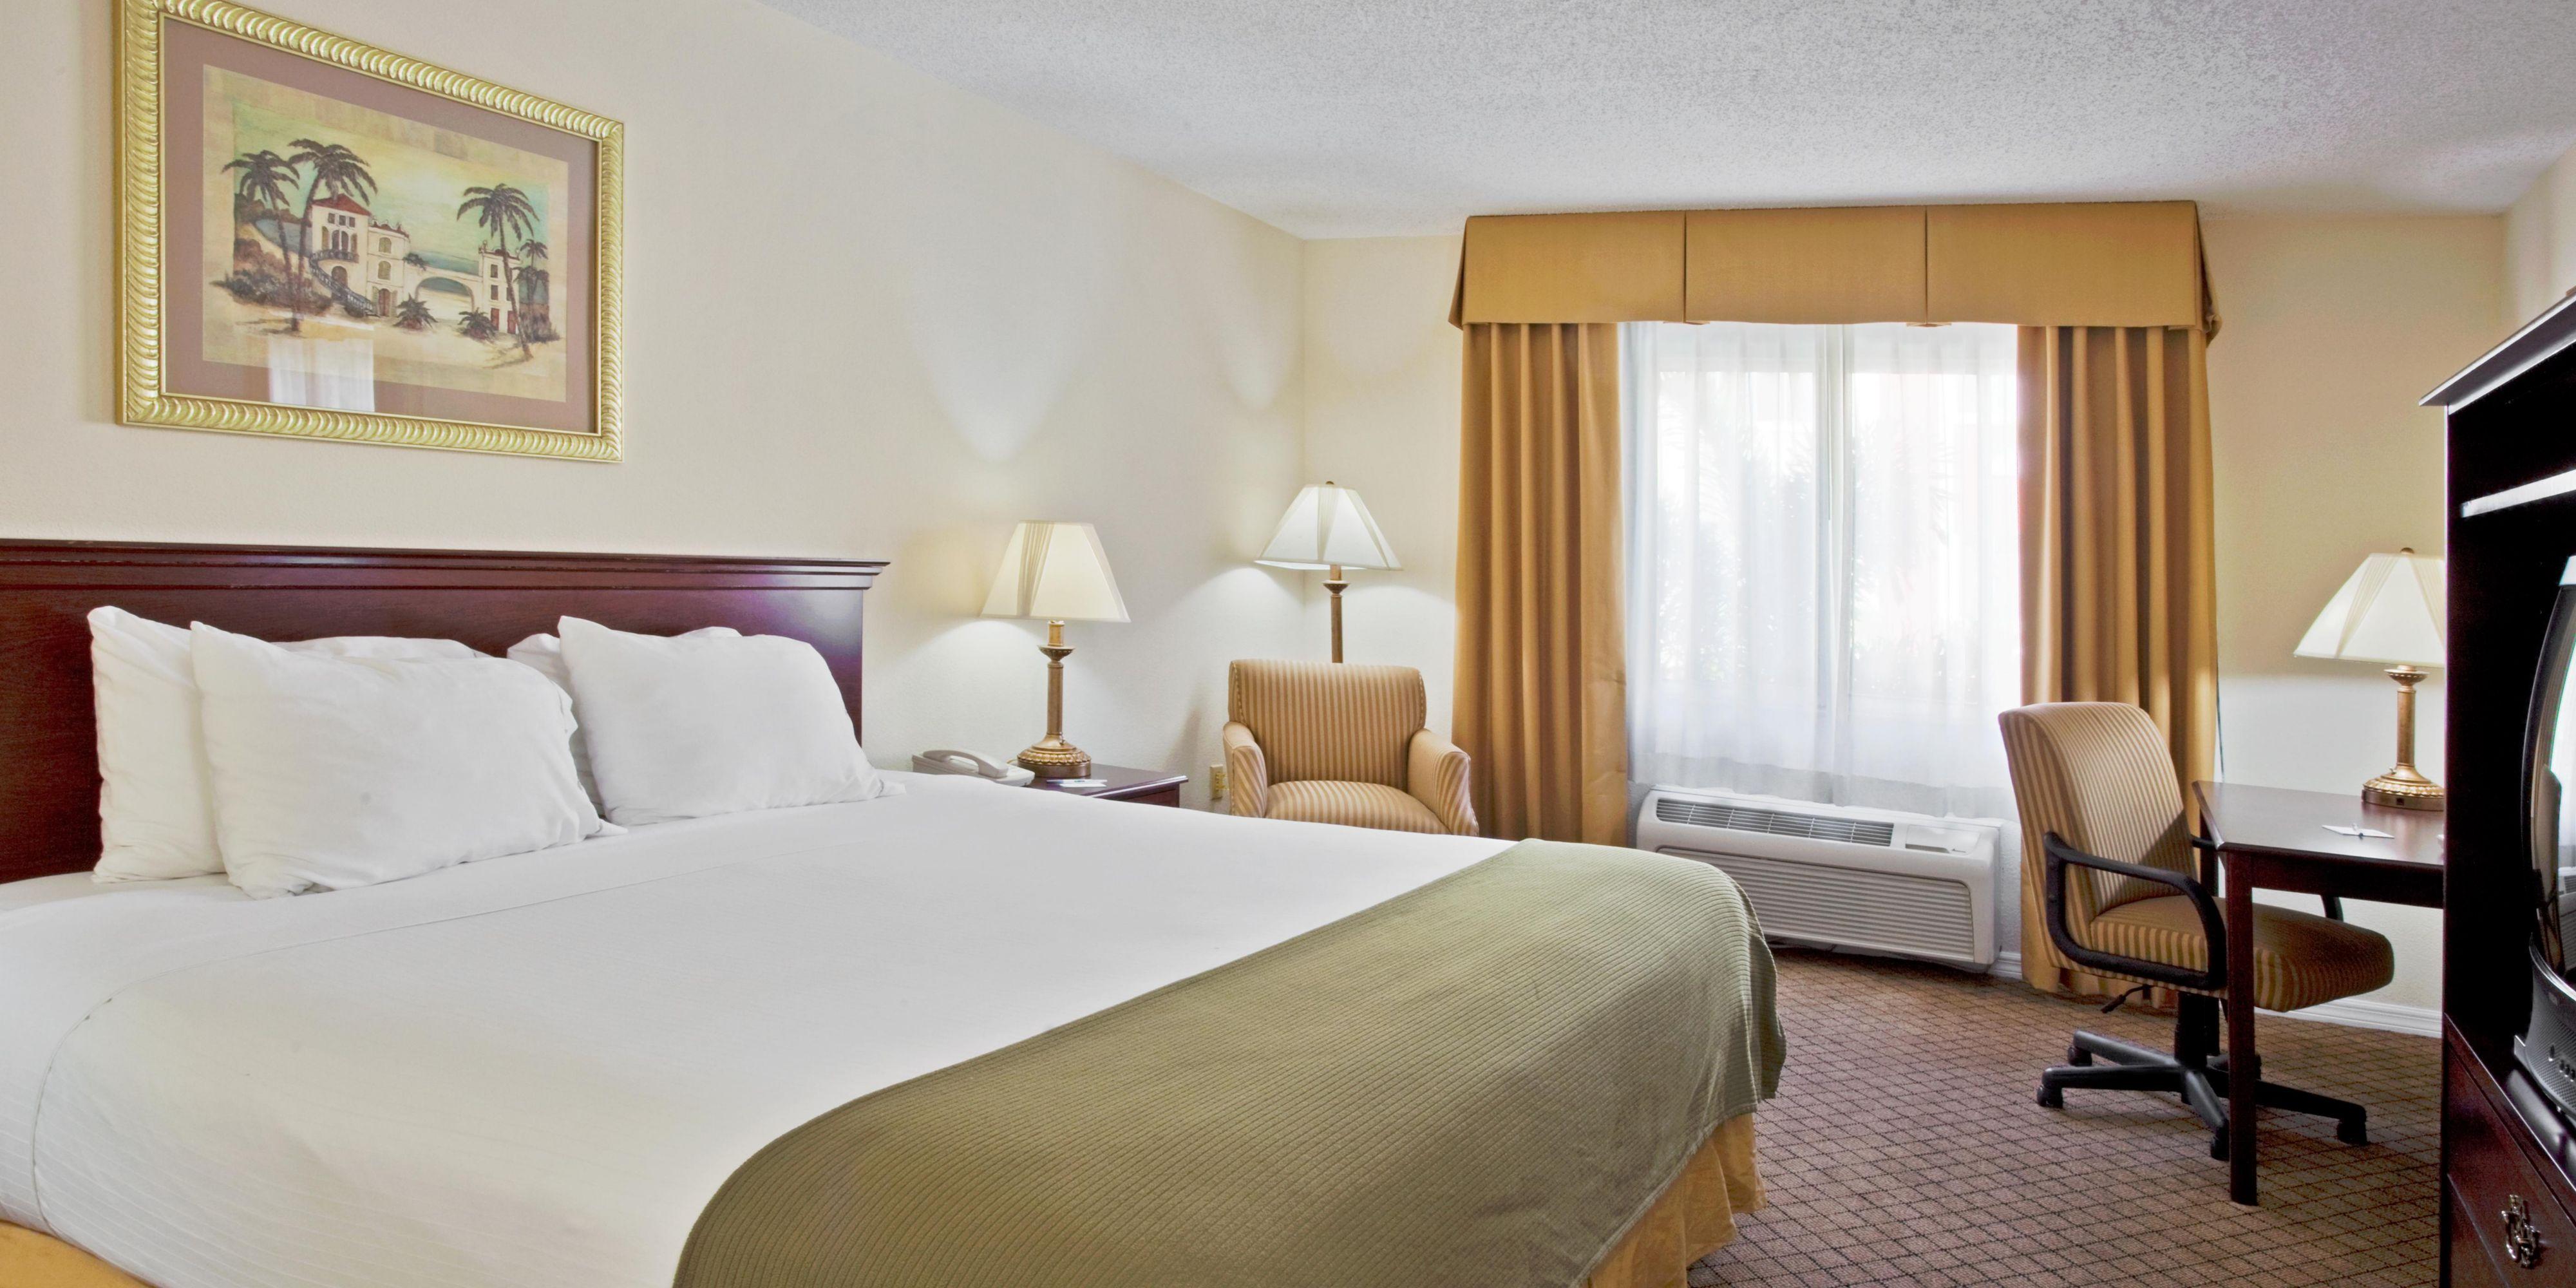 Hotel in Bradenton Beach, FL - Holiday Inn Express & Suites